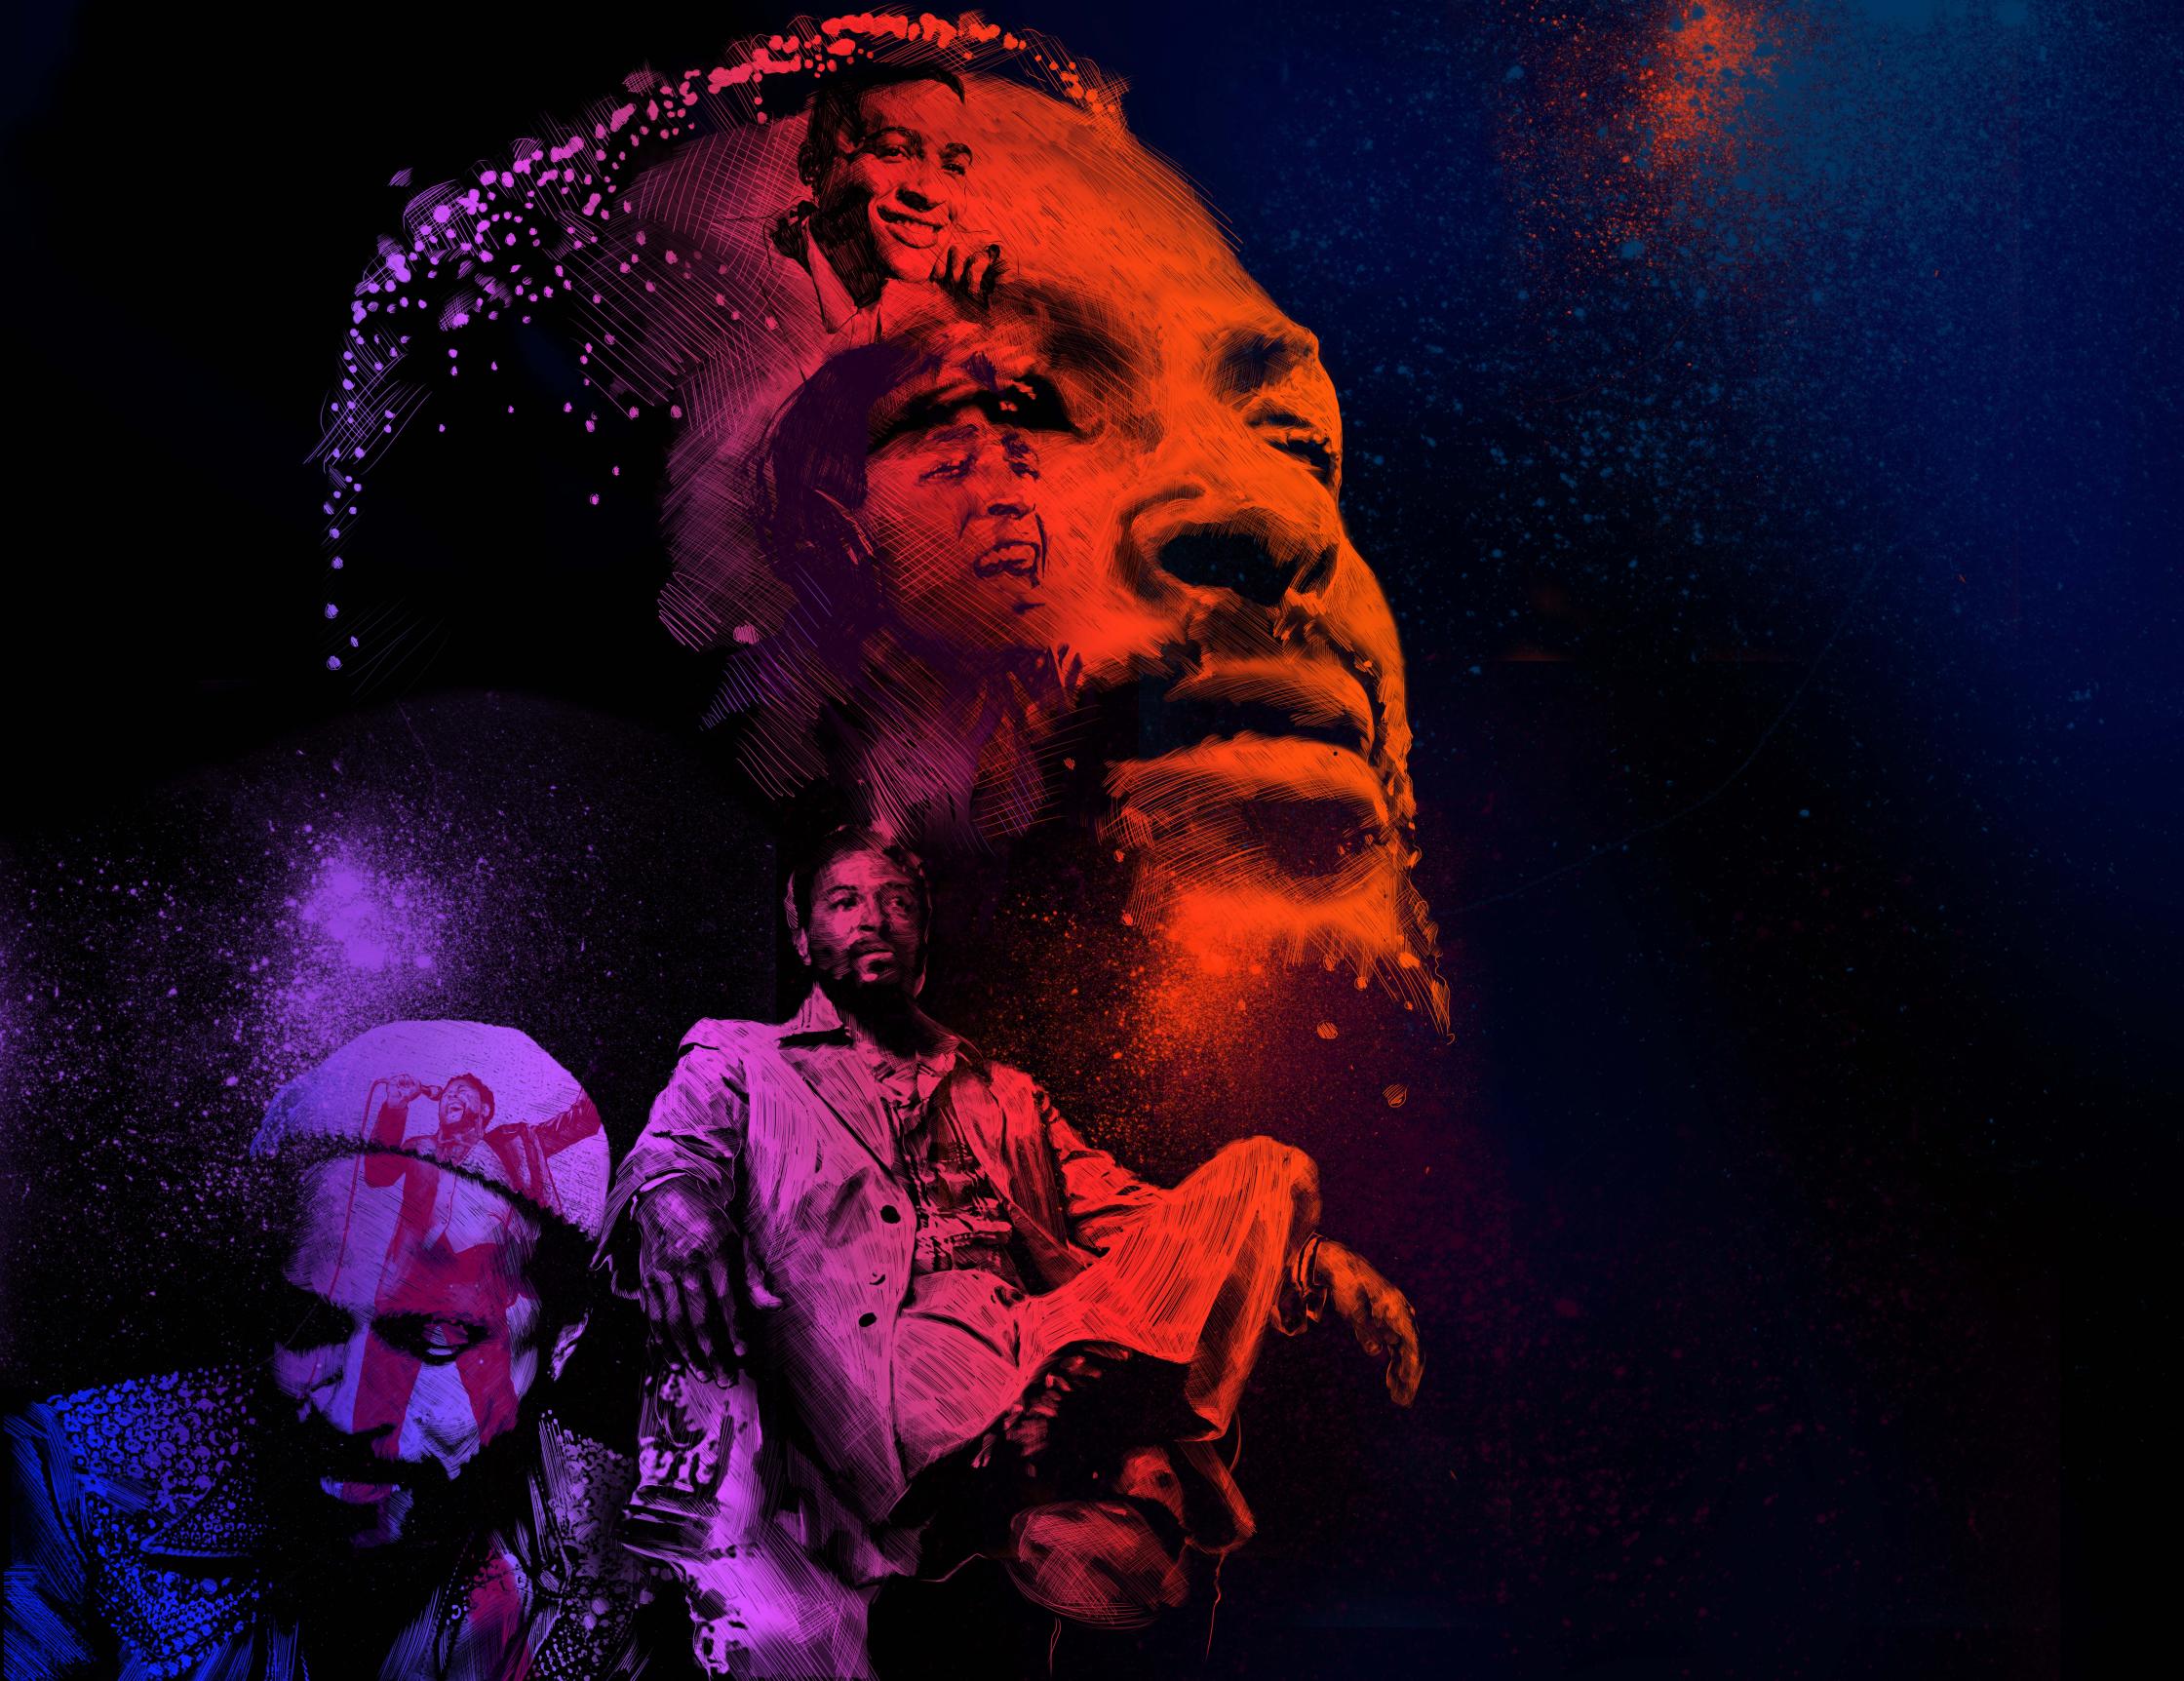 Marvin Gaye / Universal Music